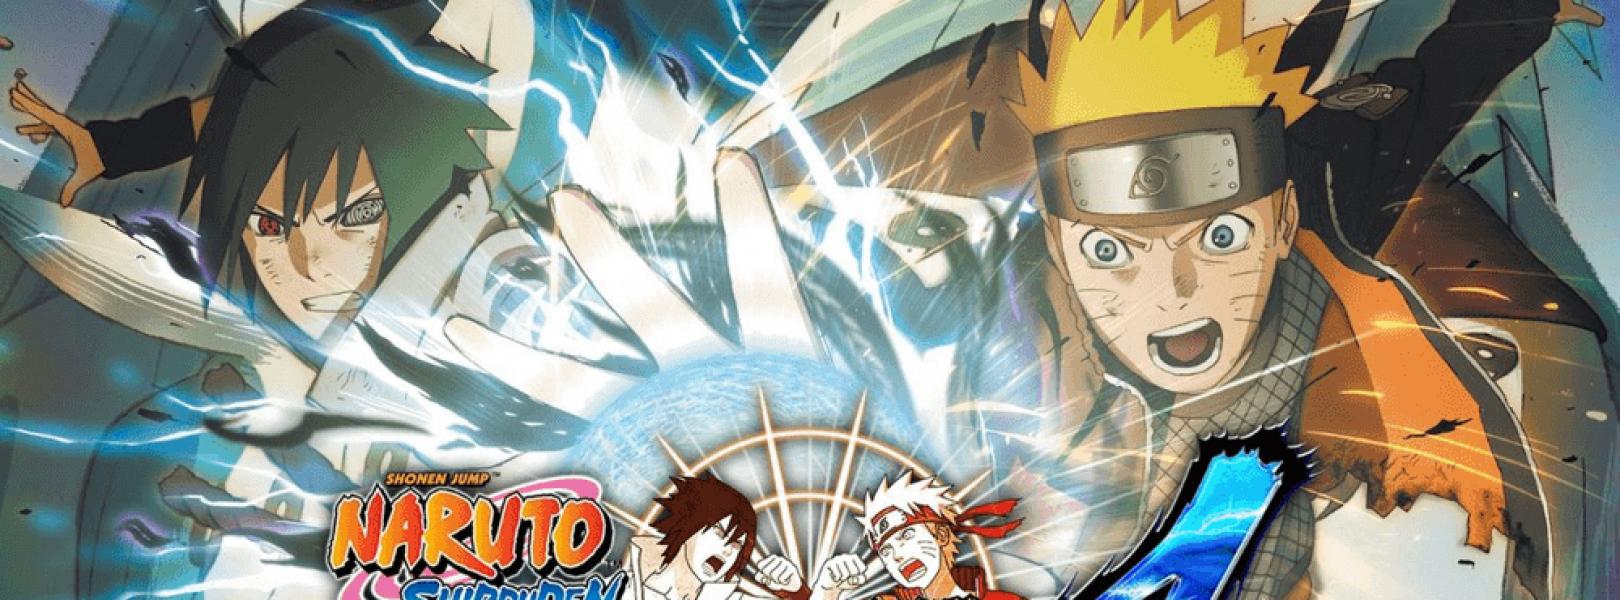 Naruto Shippuden: Ultimate Ninja Storm 4 – Capsule Computers